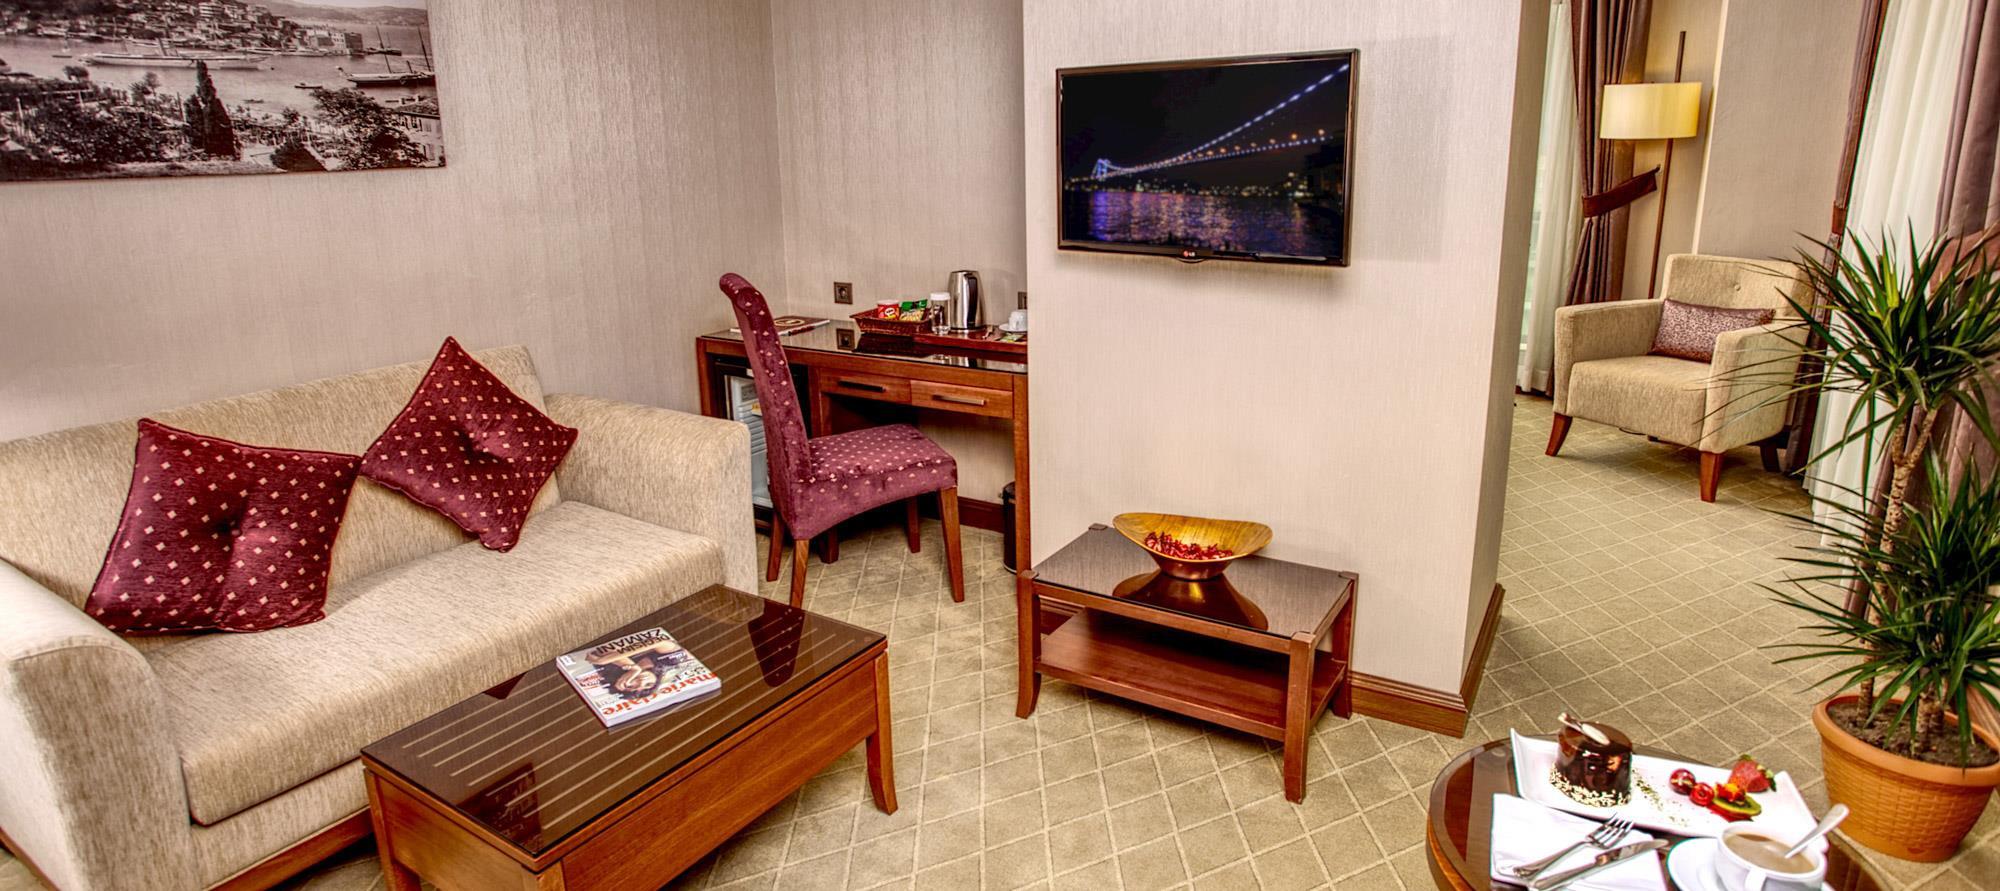 Grand Makel Hotel Topkapi254613